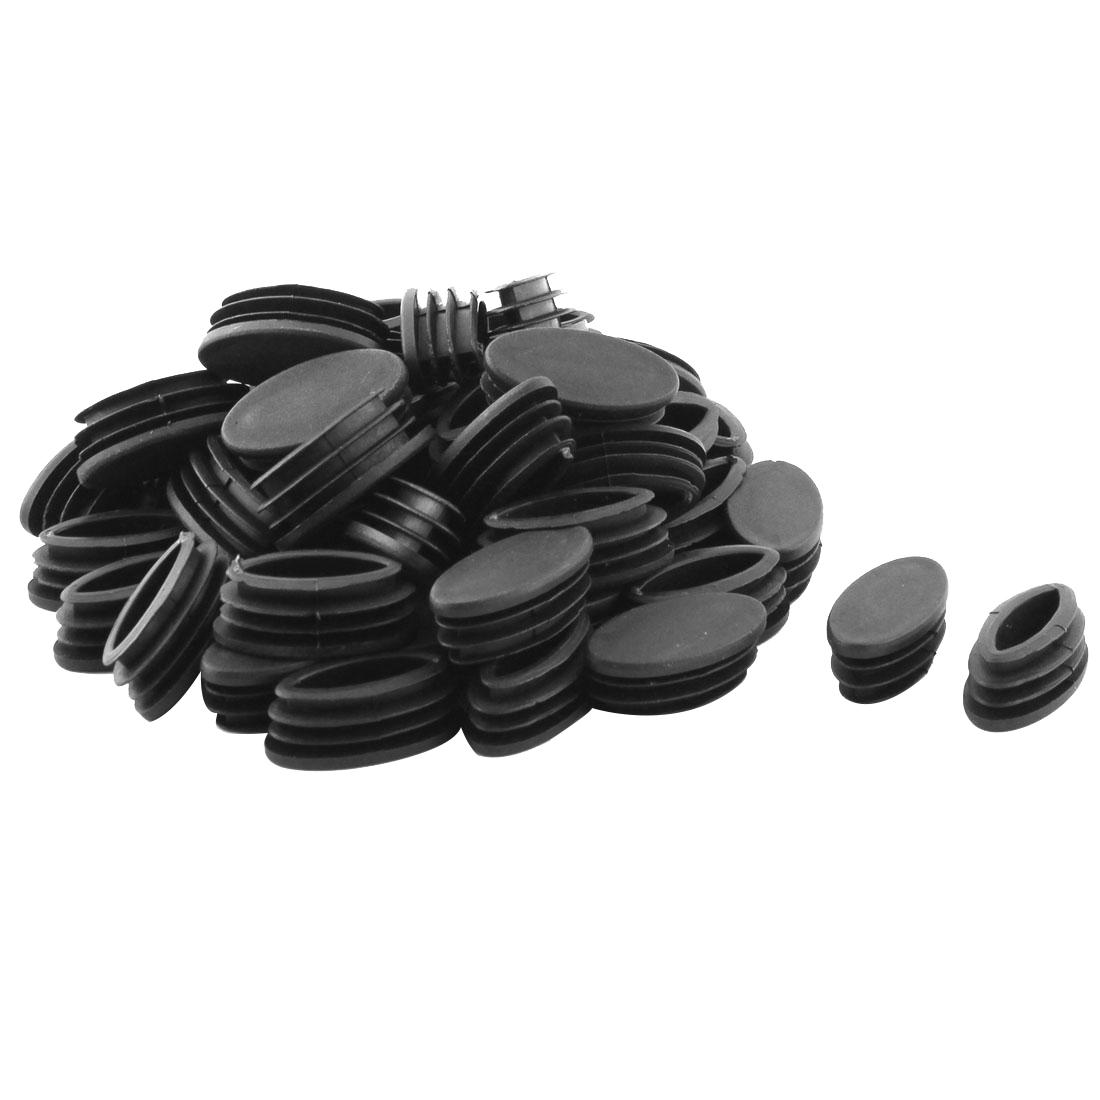 Desk Chair Feet Plastic Oval Pipe Tube Insert End Cap Black 20 x 40mm 50 Pcs